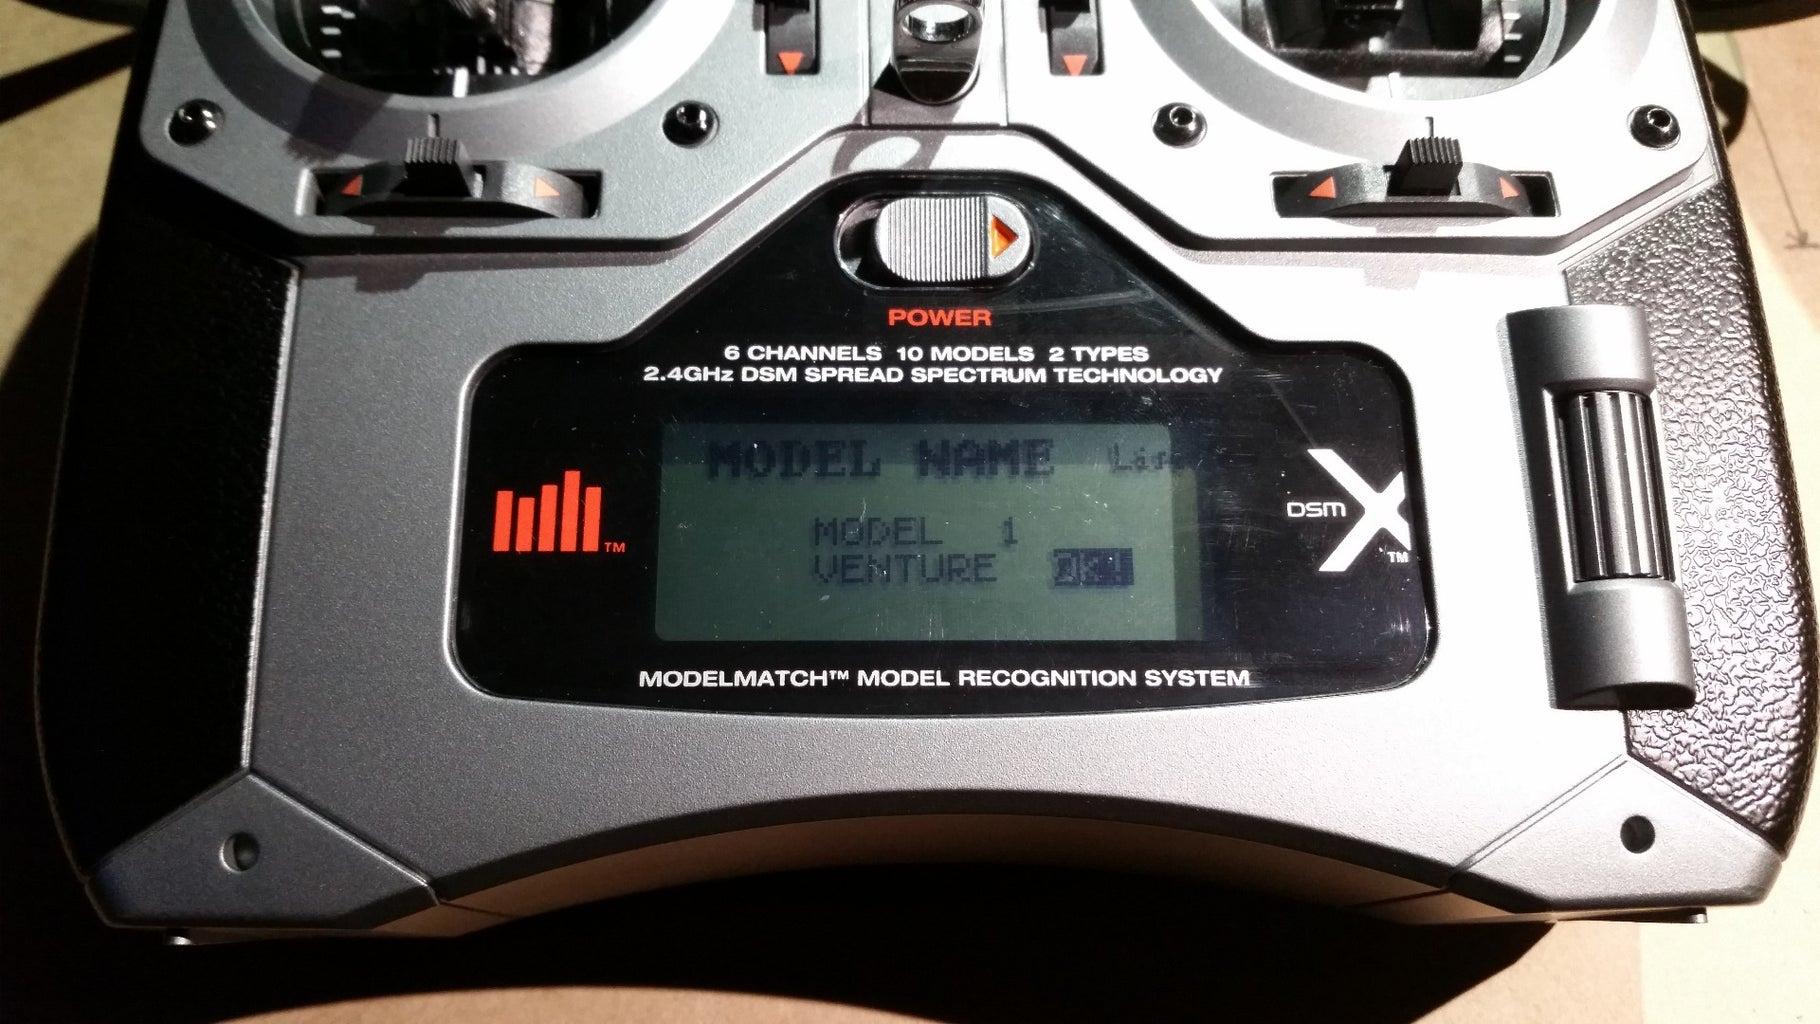 Set the Model in the Spektrum DX6i